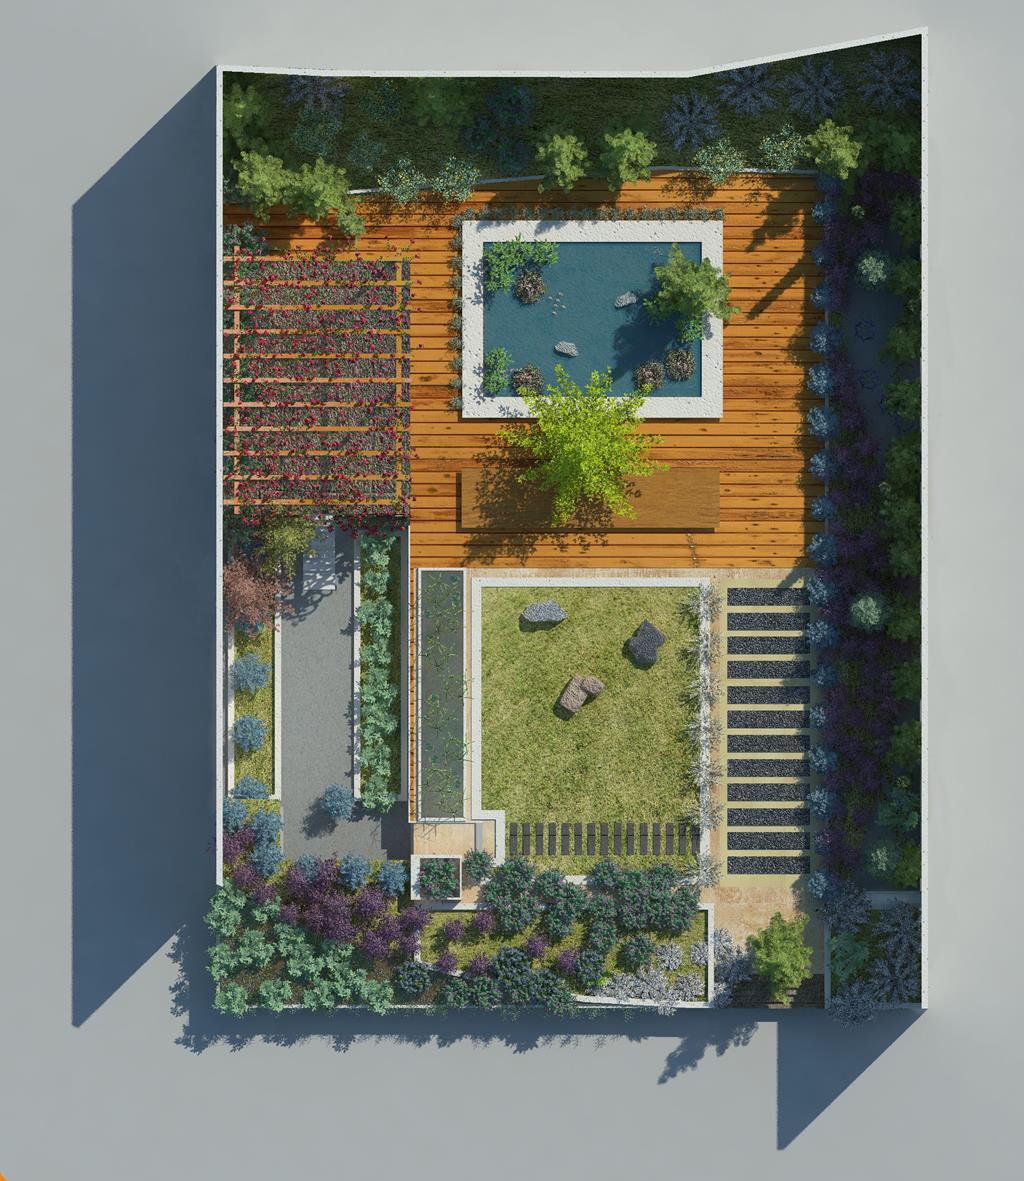 Dise os realizados con lands design jardin minimalista - Paisajismo minimalista ...